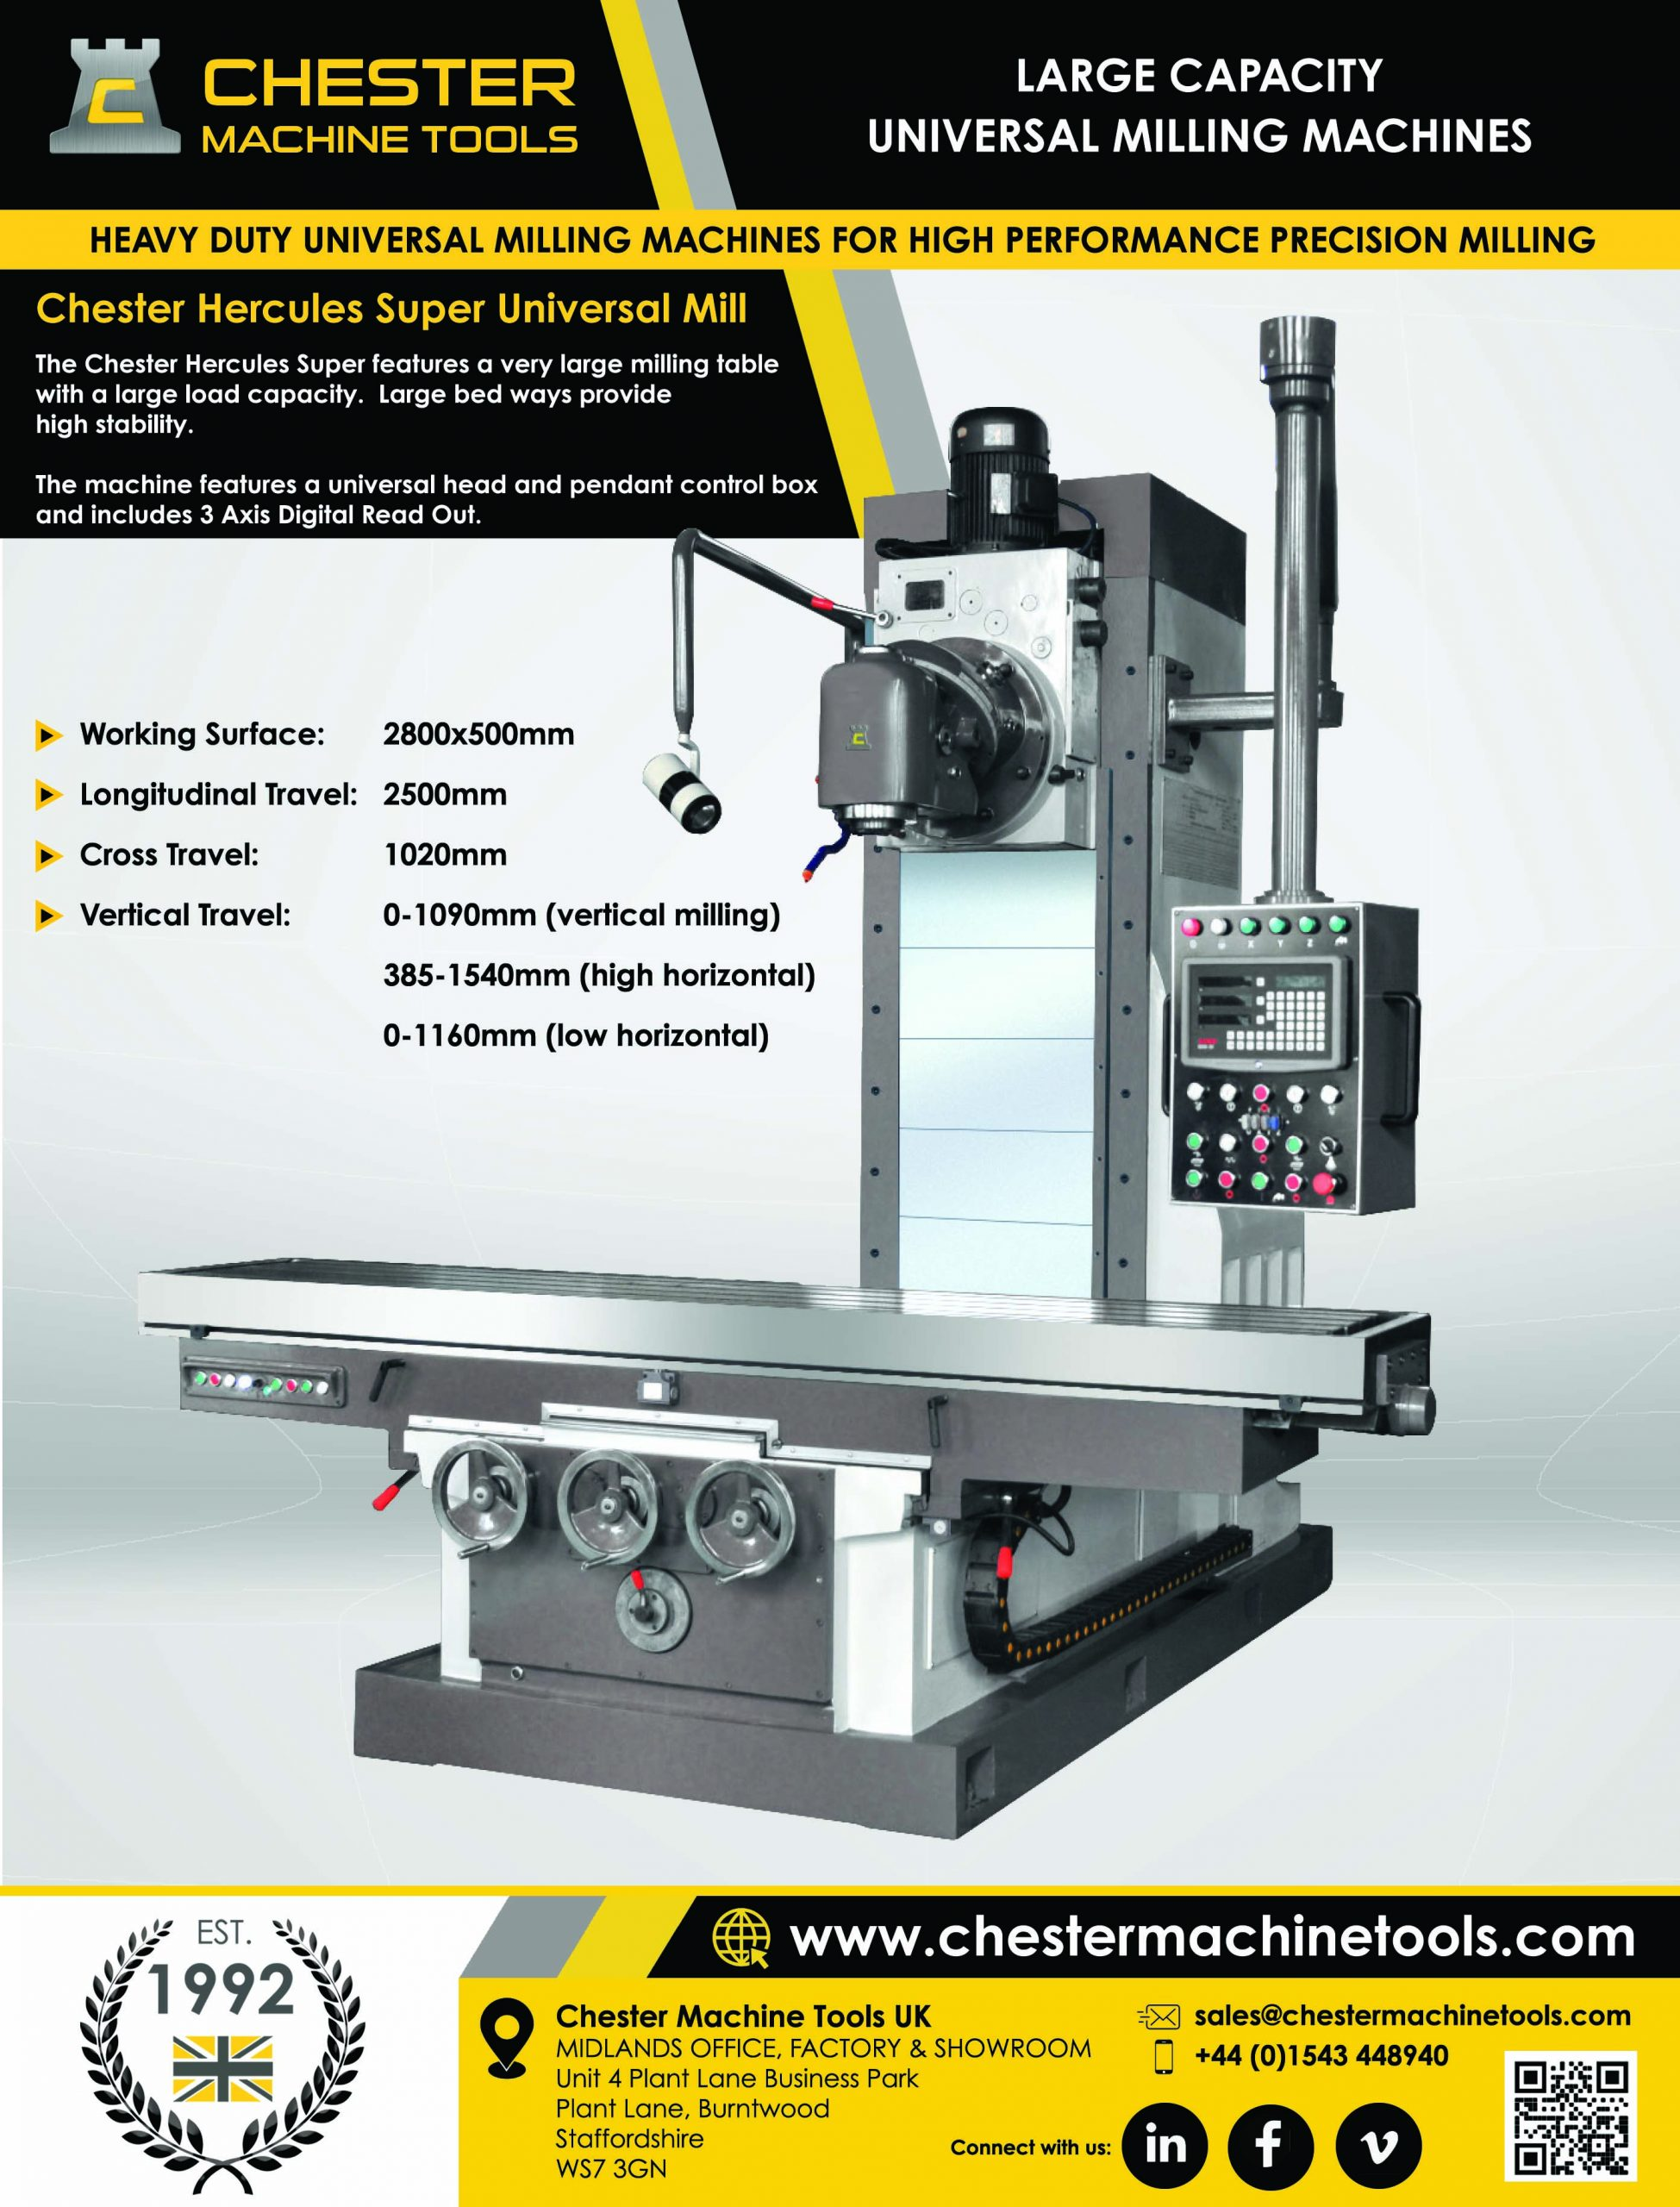 Heavy Duty Universal Milling Machines